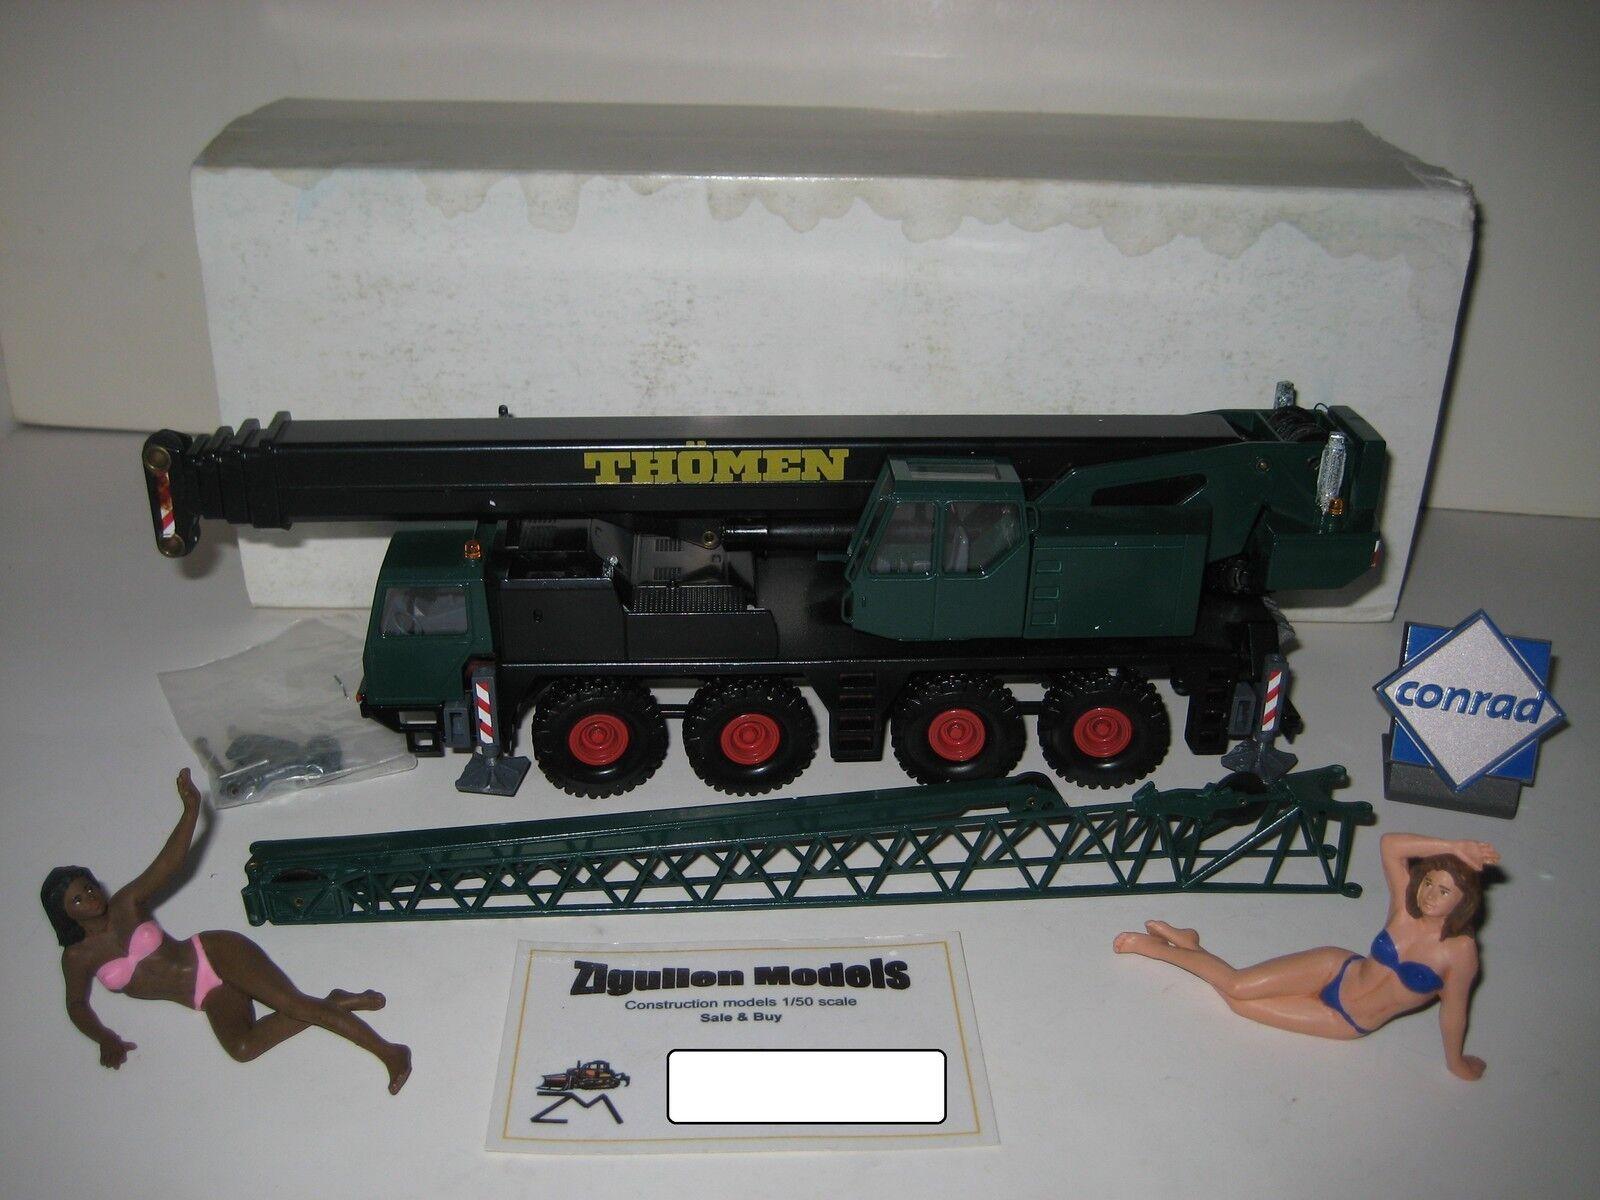 Liebherr ltm 1090-1 autokran thömen 1. version  2087.8a conrad 1 50 ovp